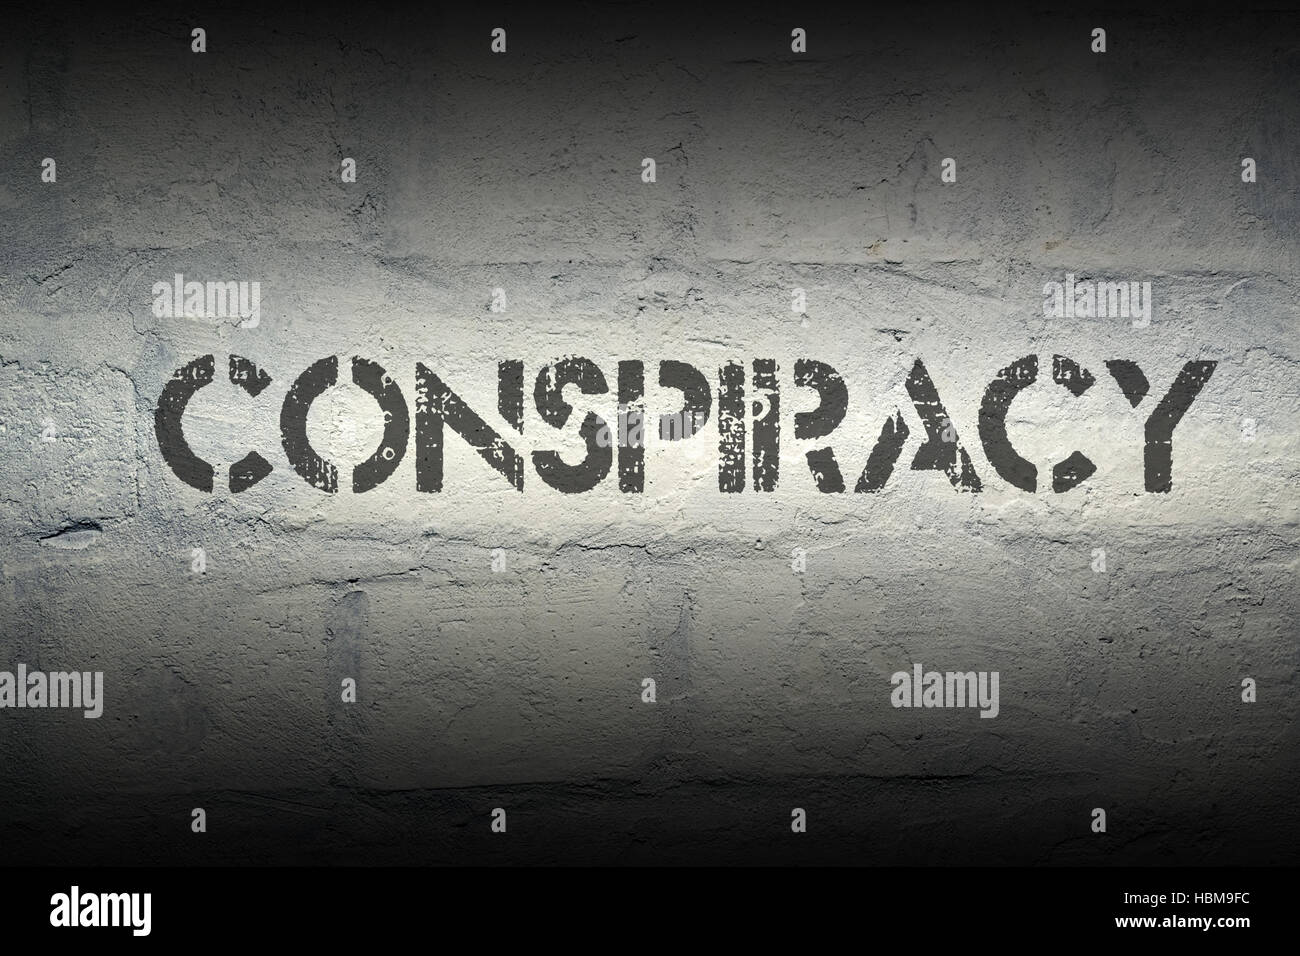 conspiracy - Stock Image